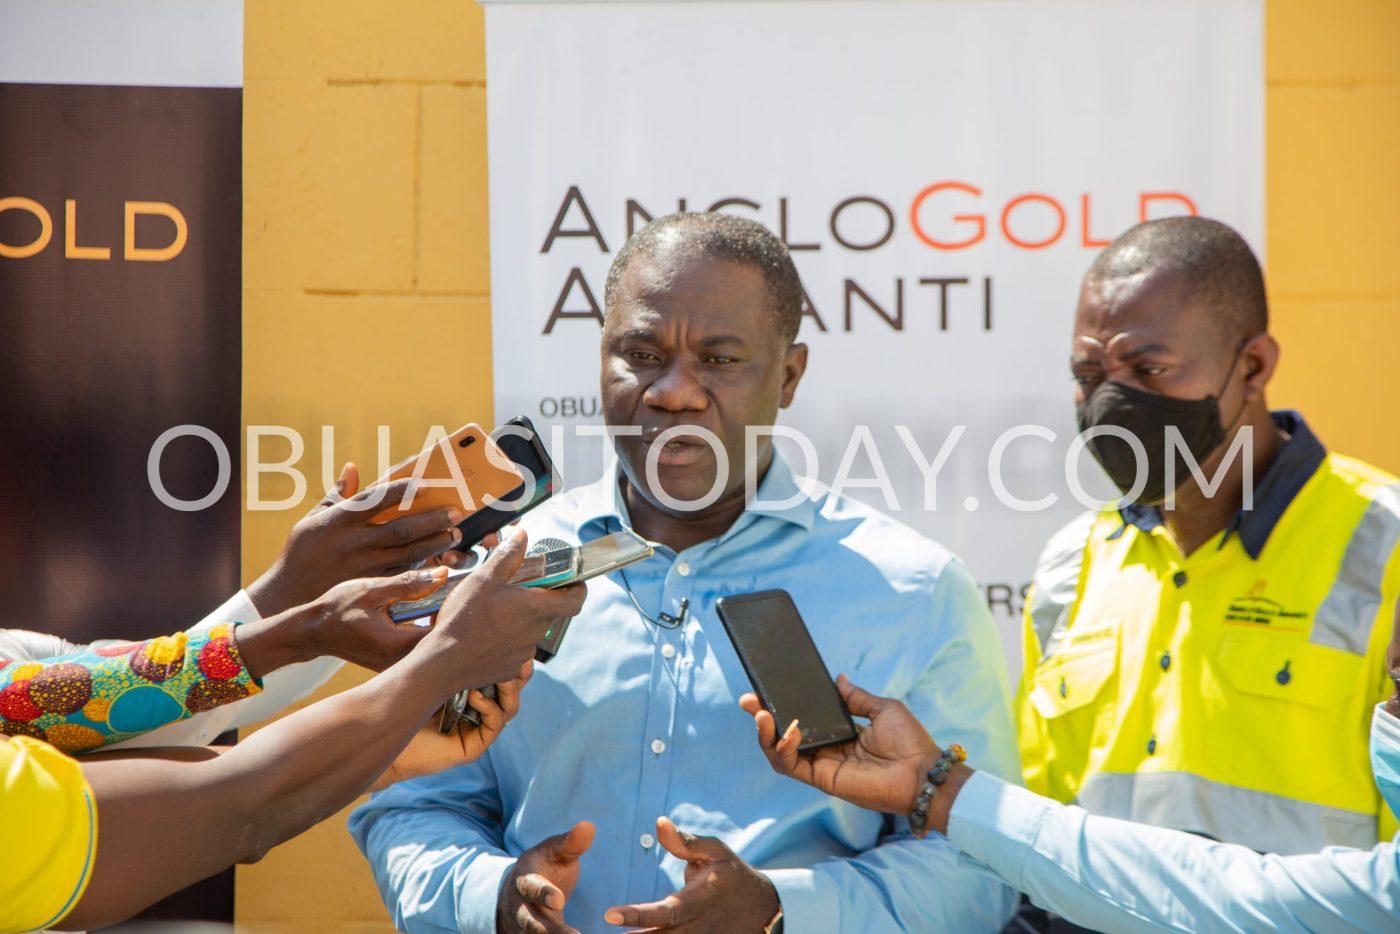 Managing Director of Anglogold Ashanti Ghana, Eric Asubonteng